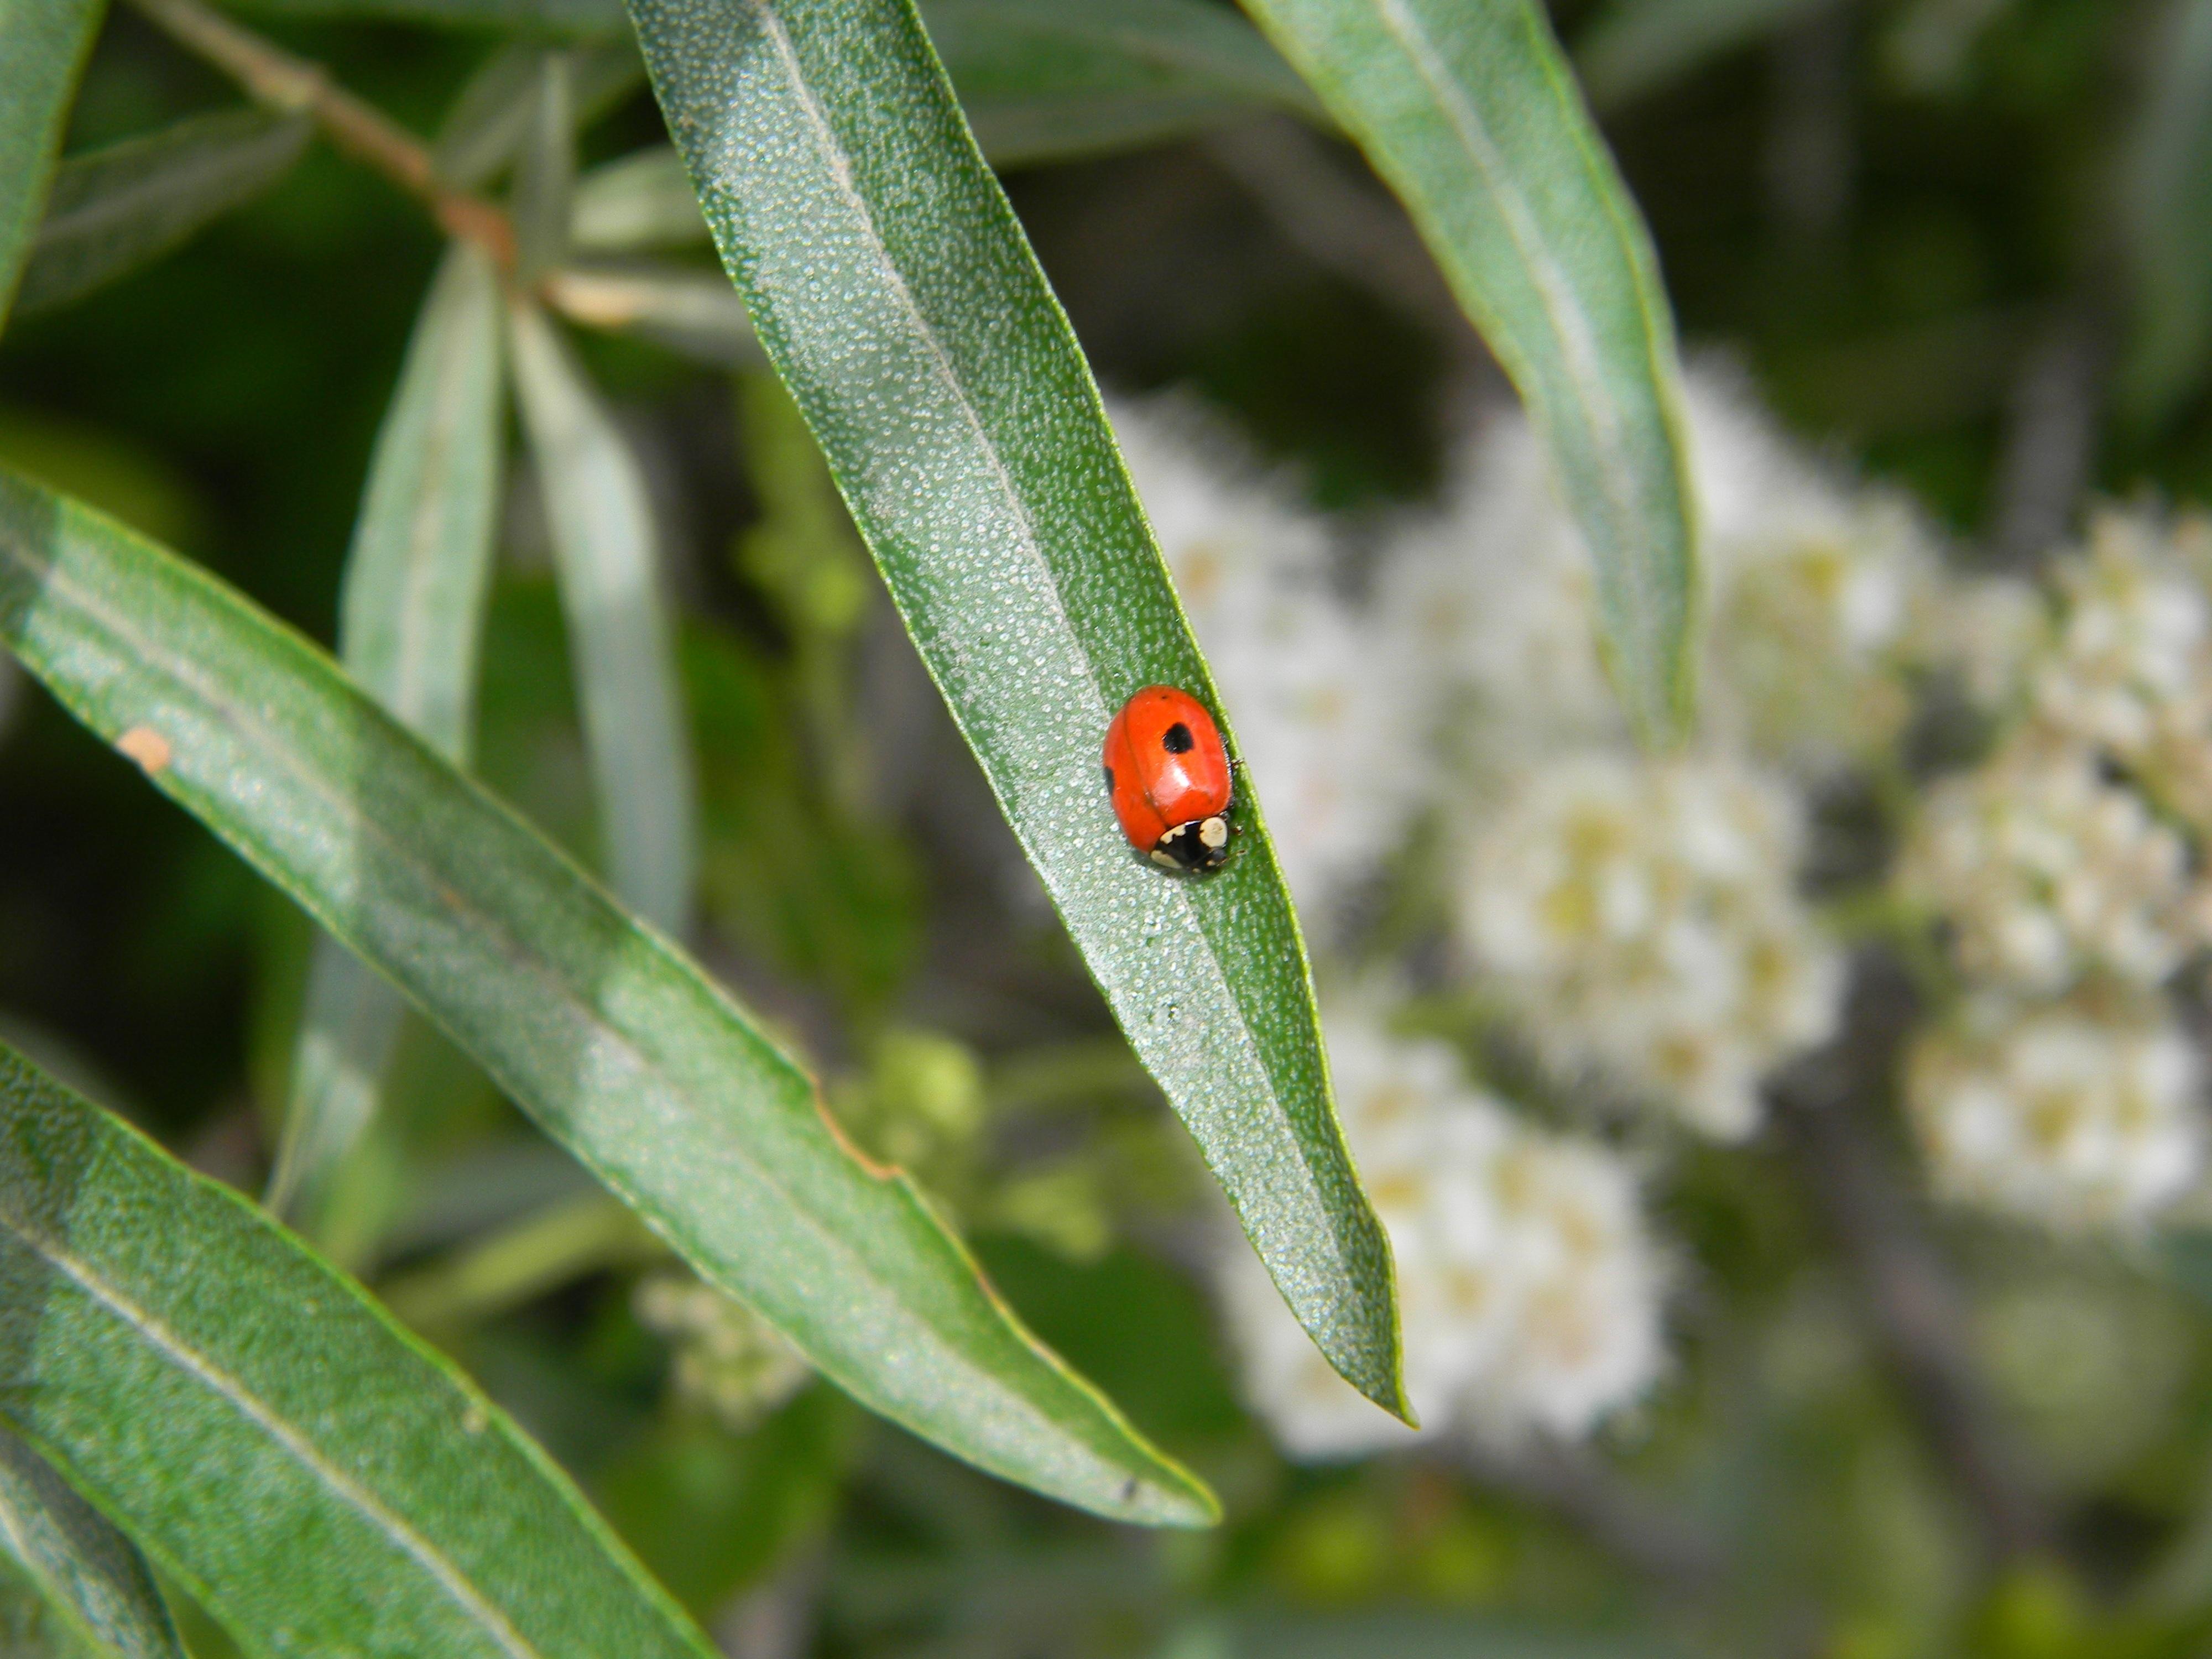 Fotos gratis rbol naturaleza rama planta hoja flor - Plantas para ahuyentar insectos ...